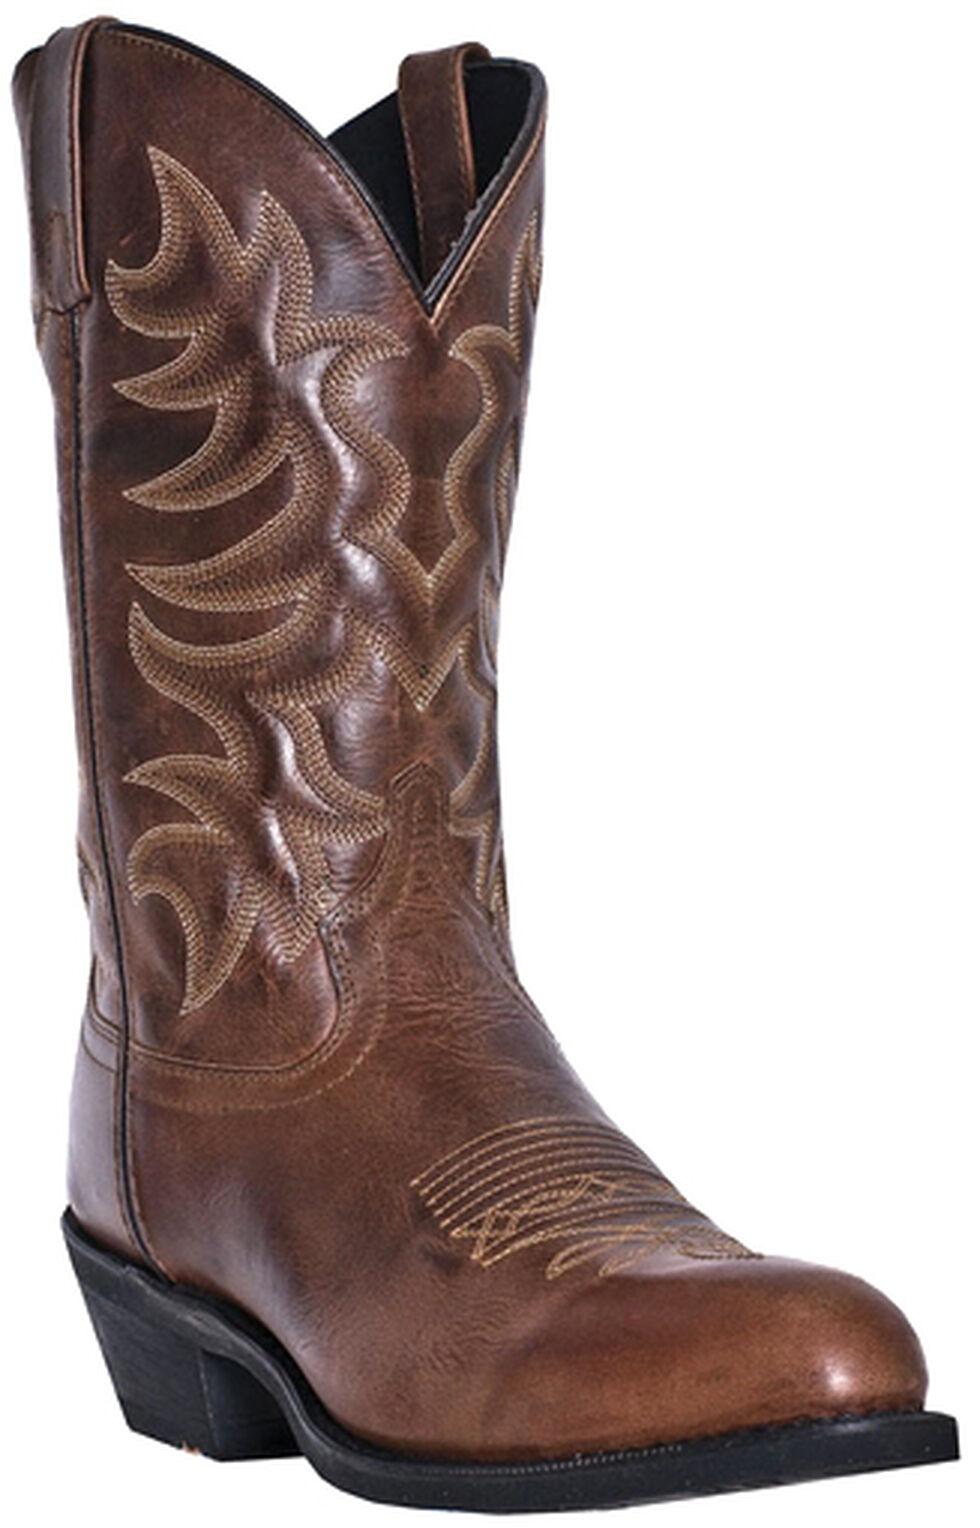 Laredo Men's Pinehurst Cowboy Boots - Medium Toe, Brown, hi-res